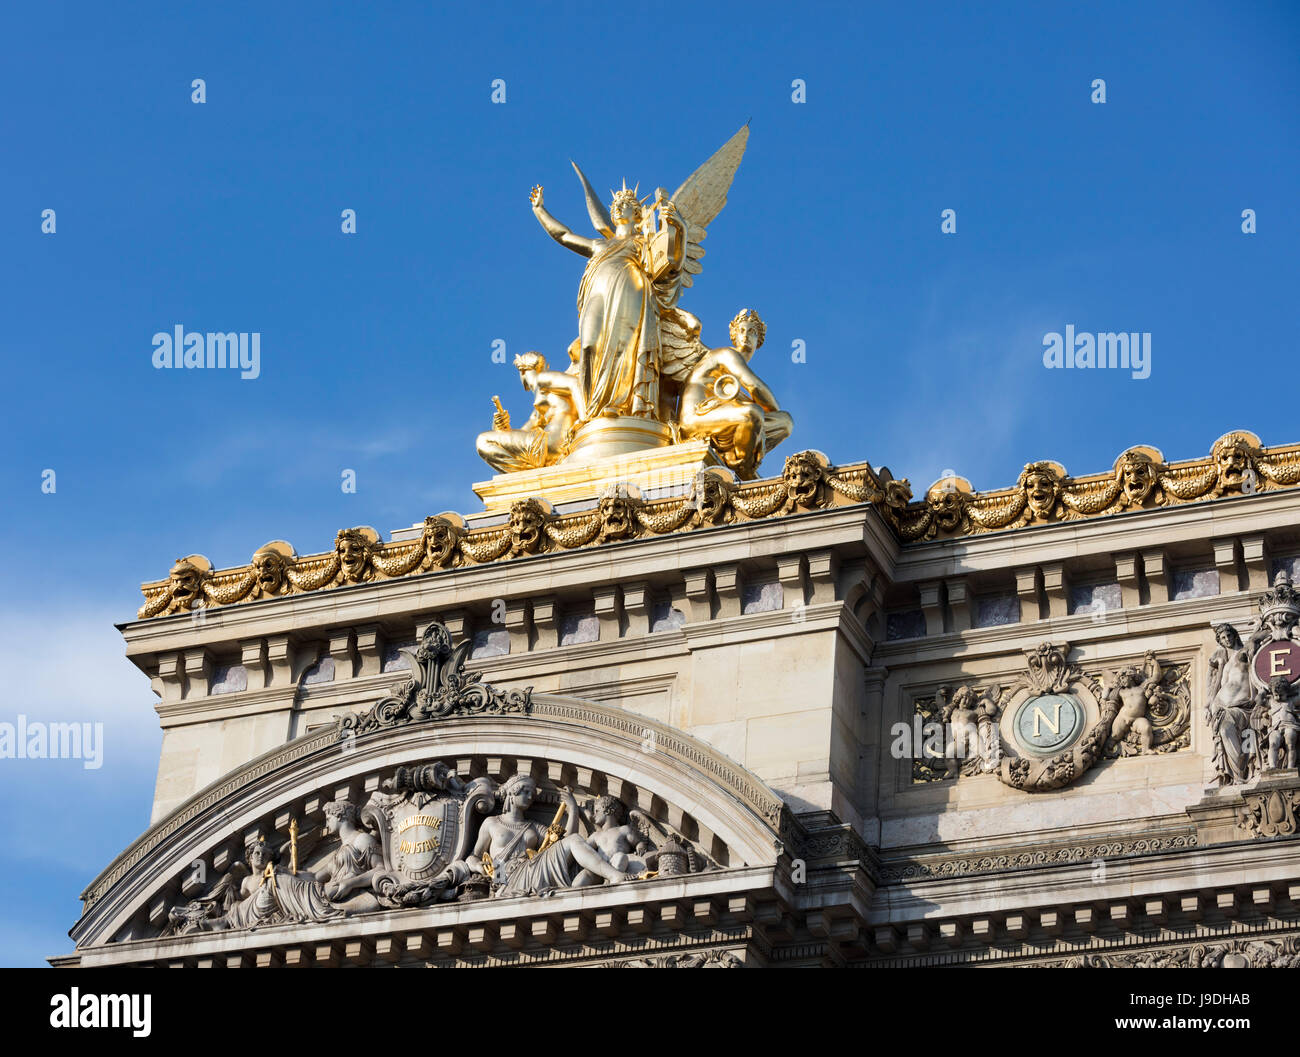 Gumery's statue of Harmony, Palais Garnier Opera House, Paris, France - Stock Image